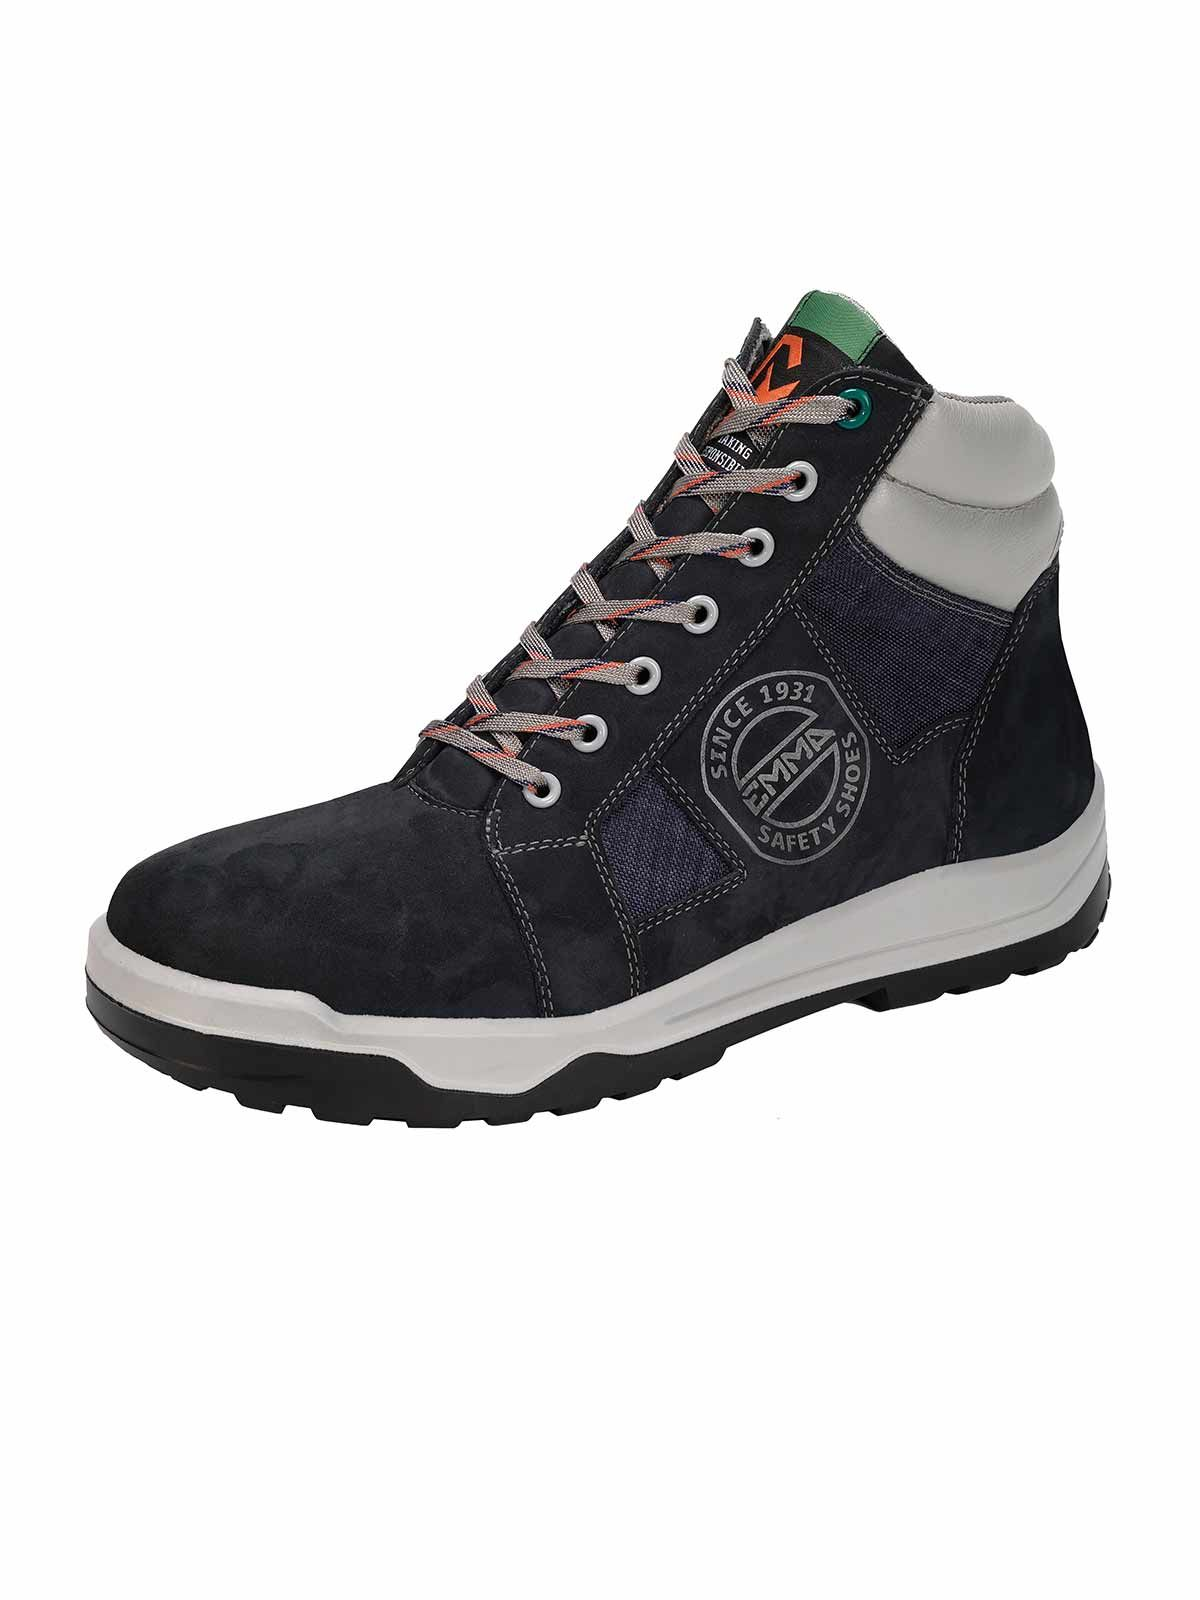 Emma Jordan D S1P Metal Free Work Shoes